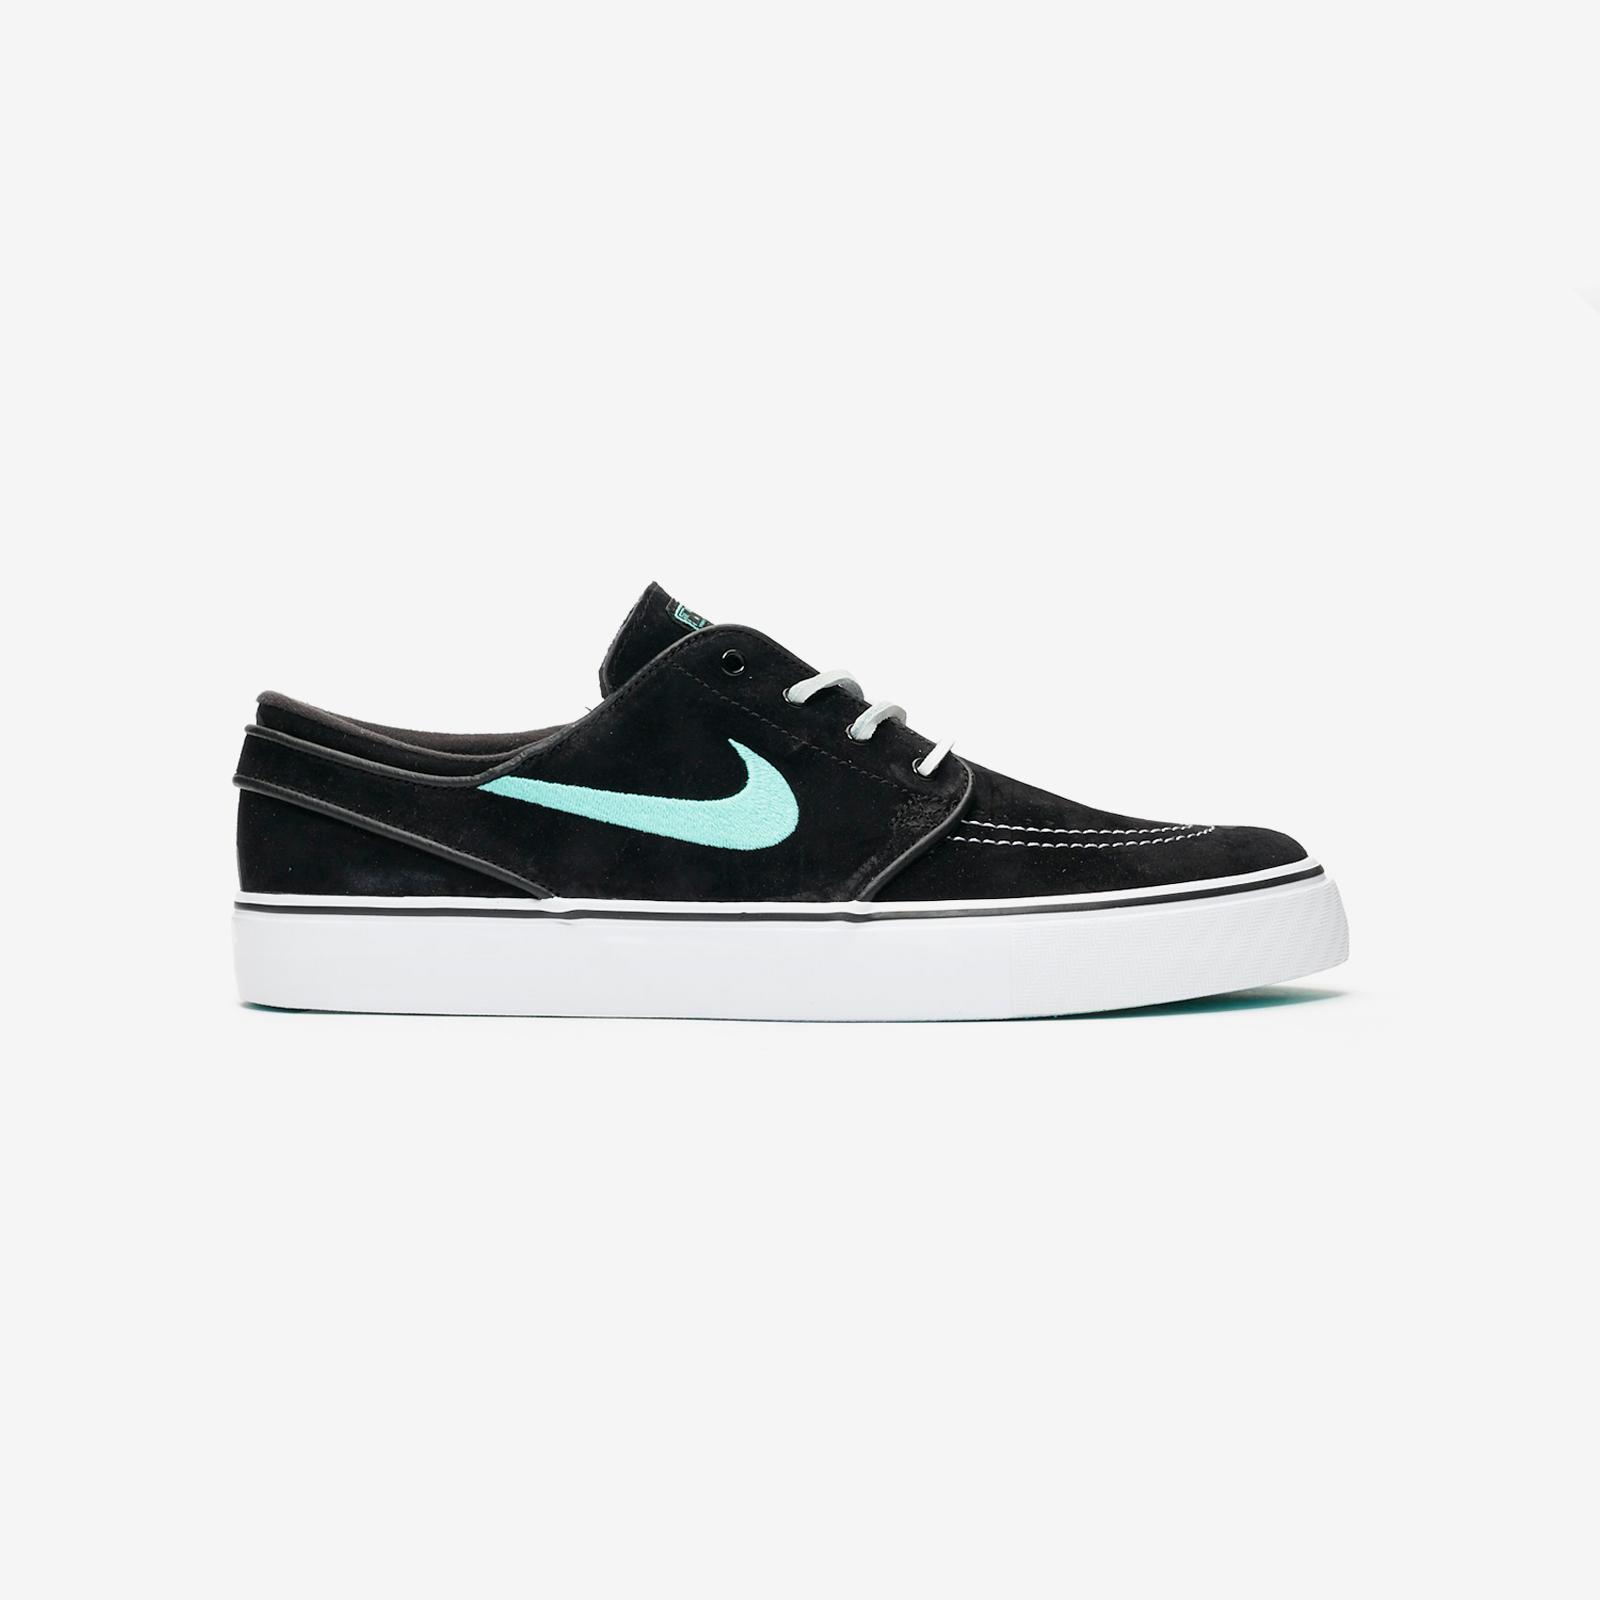 c4ee03a2e90 Nike Zoom Janoski OG - 833603-001 - Sneakersnstuff